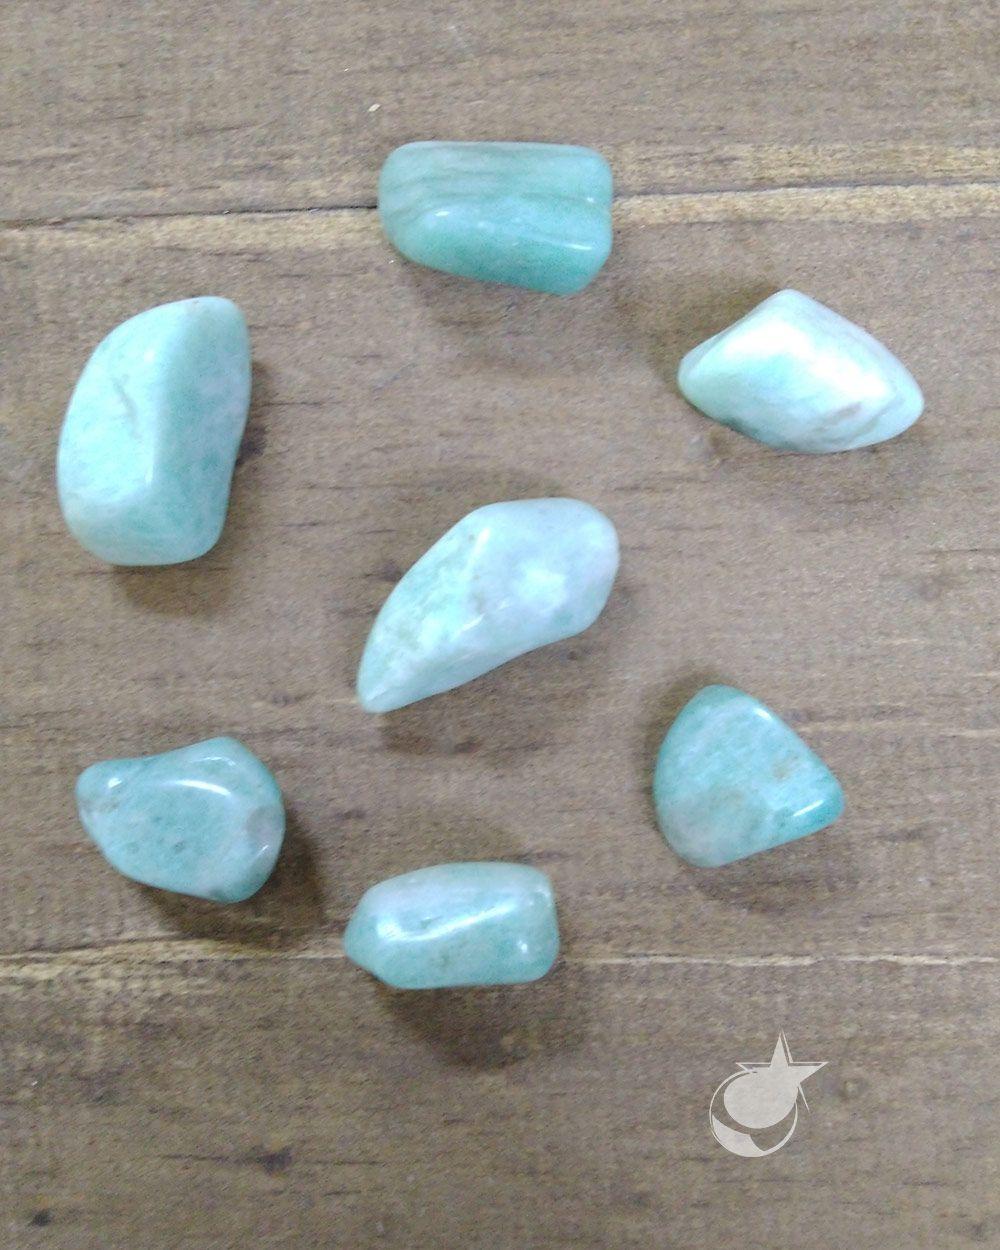 AMAZONITA ROLADA - PACOTE 40g -  4 a 6 pedras - PEDRA DO ANO 2021